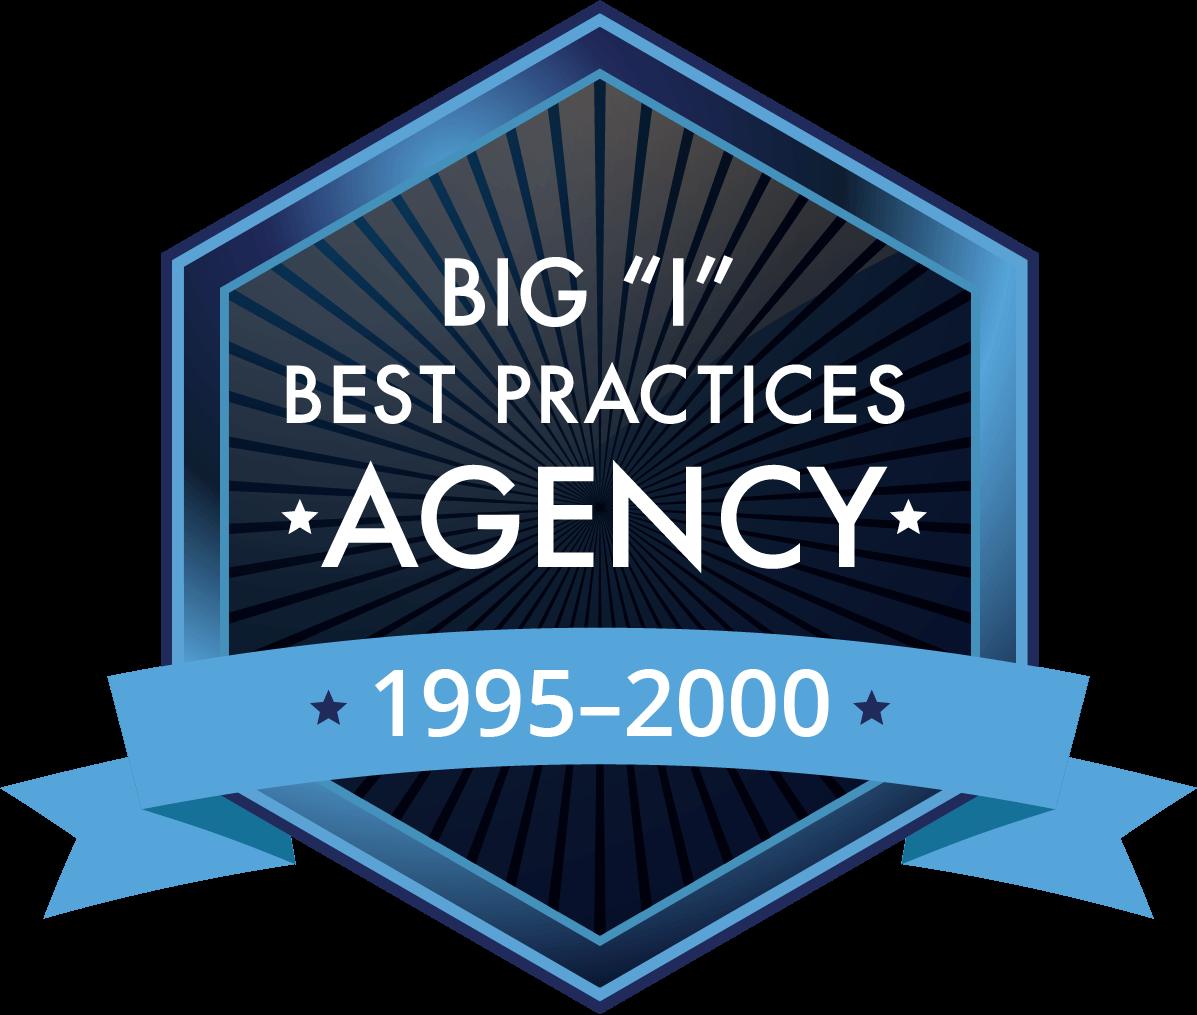 "Big ""I"" Best Practices Agency 1995-2000"